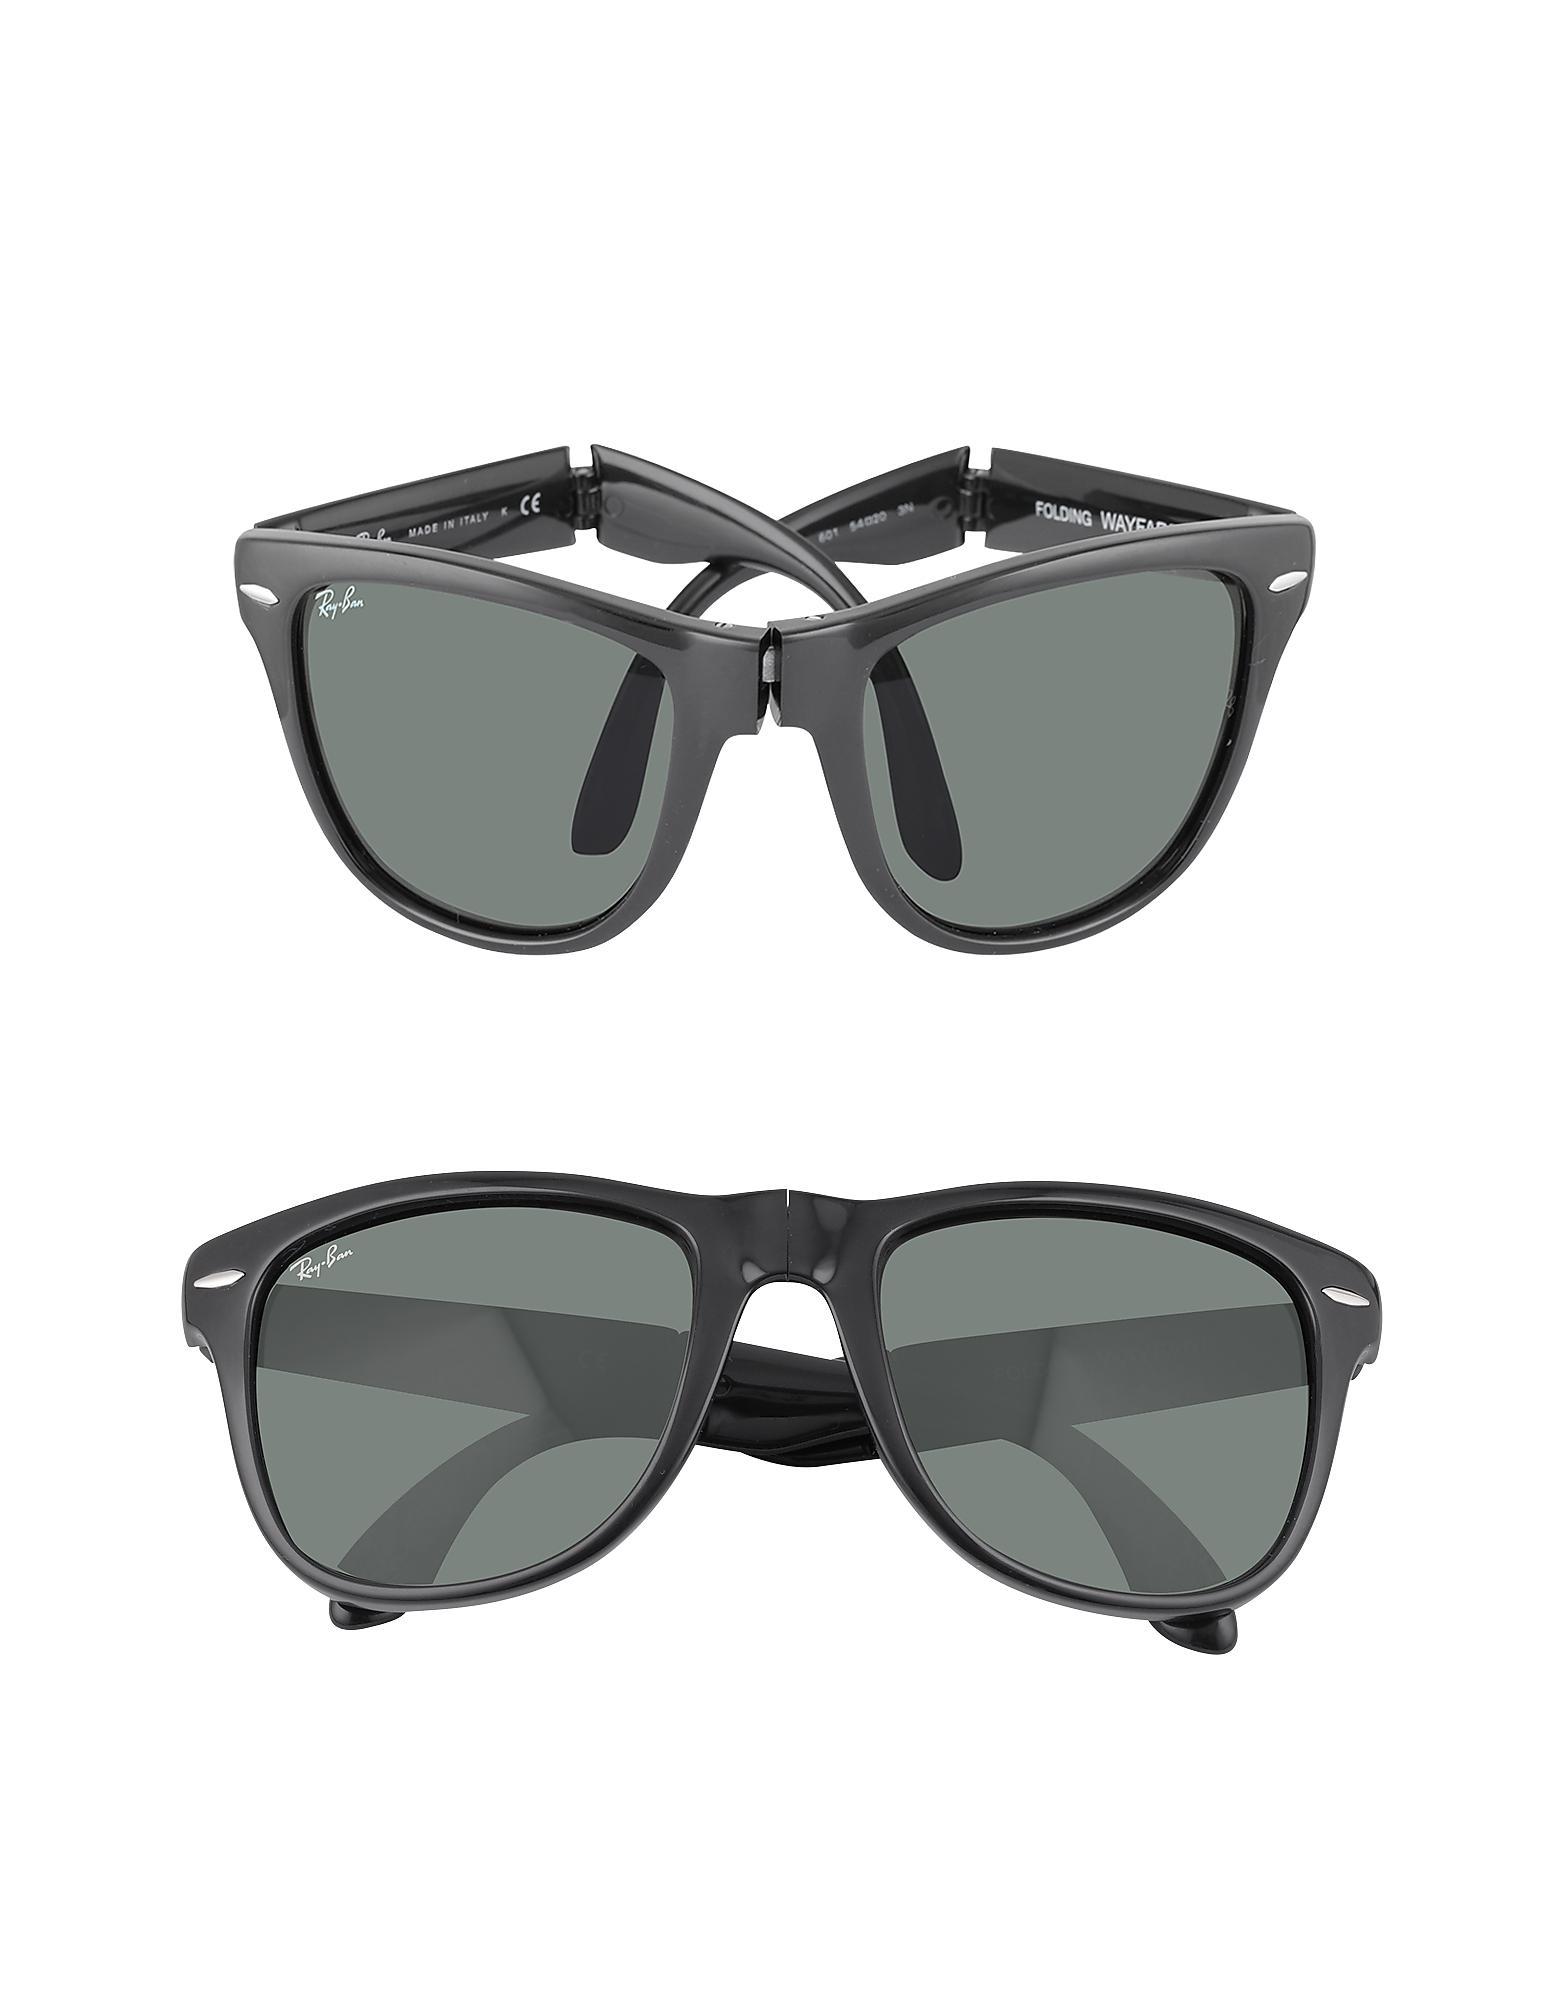 0dc77b989adaa Lyst - Ray-Ban Wayfarer Folding - Square Acetate Sunglasses in Black ...